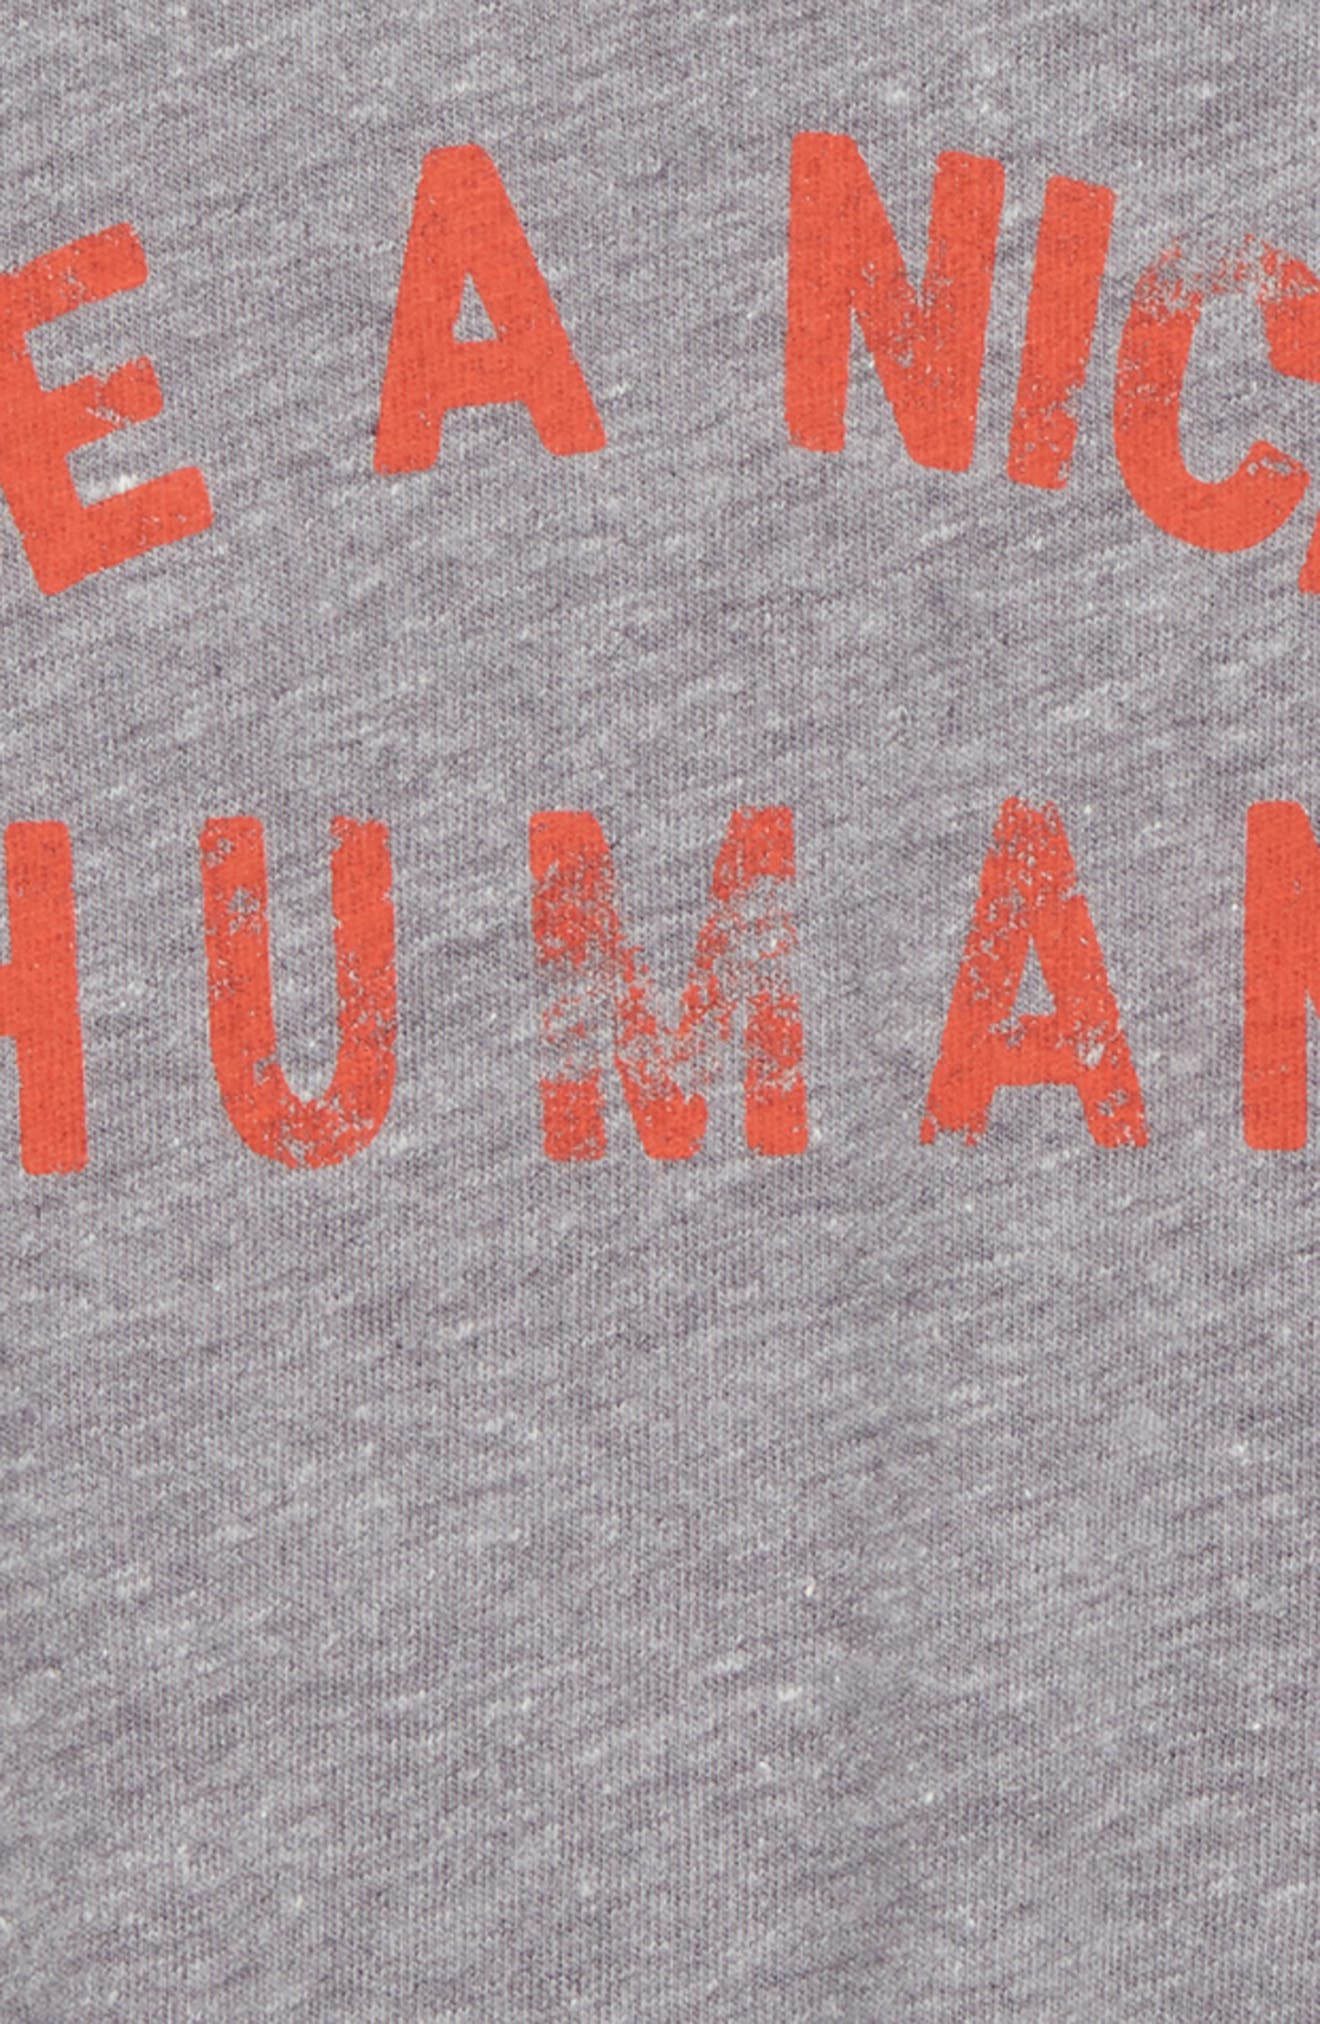 Be A Nice Human Tee,                             Alternate thumbnail 2, color,                             Heather Grey